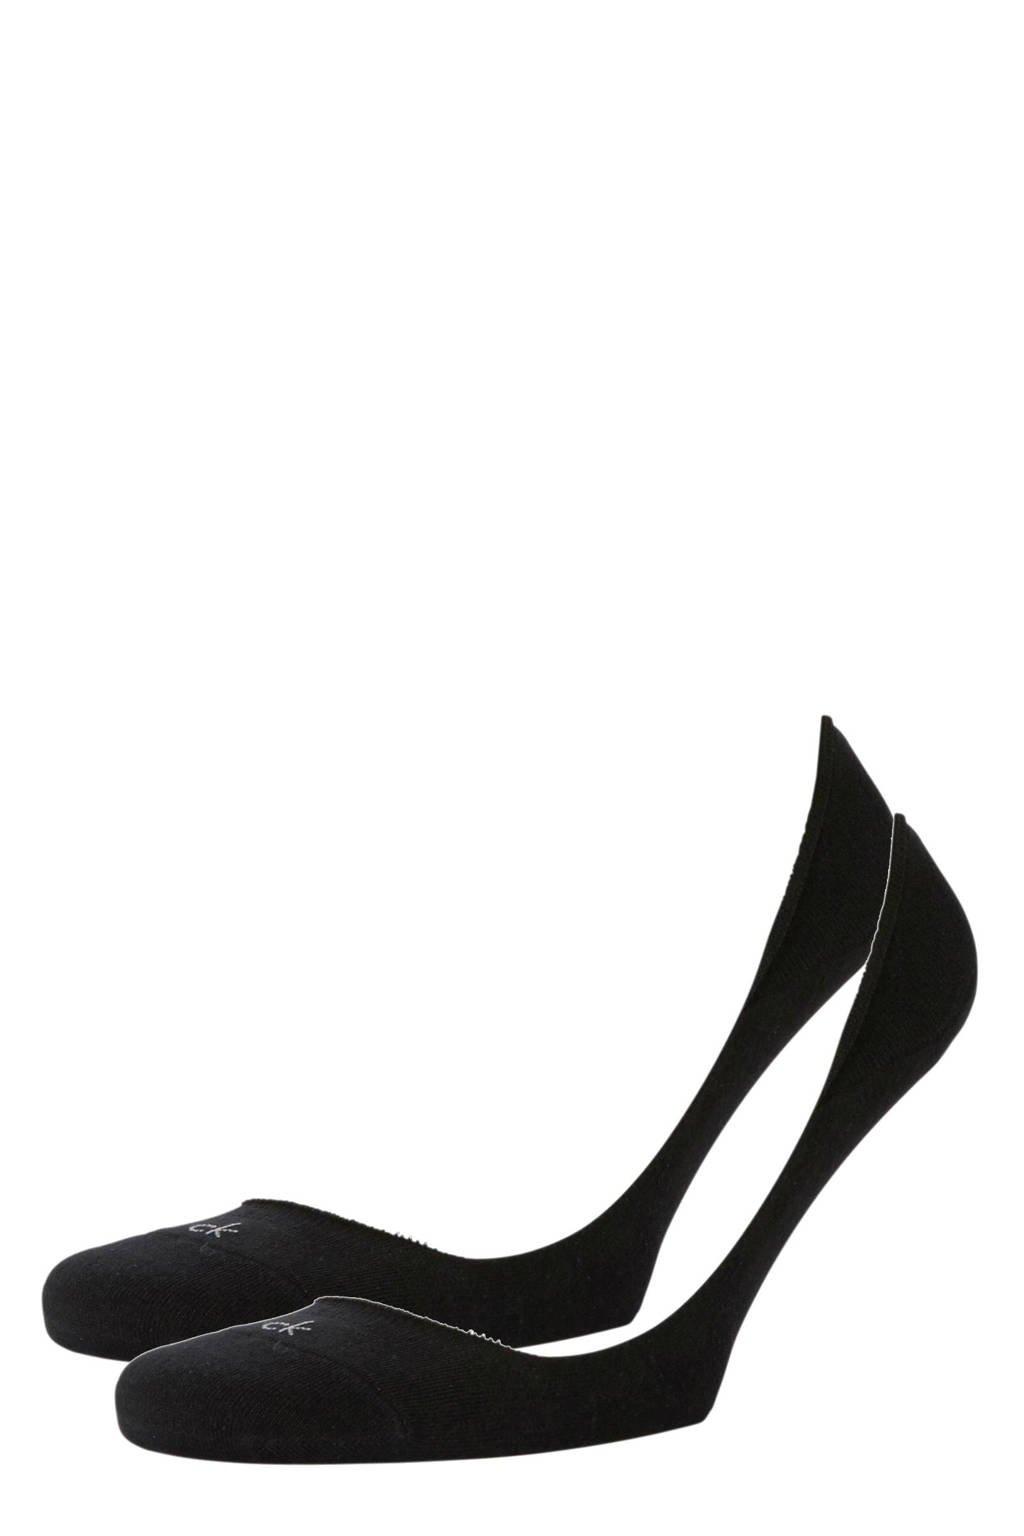 CALVIN KLEIN kousenvoetjes - 2 paar, Zwart